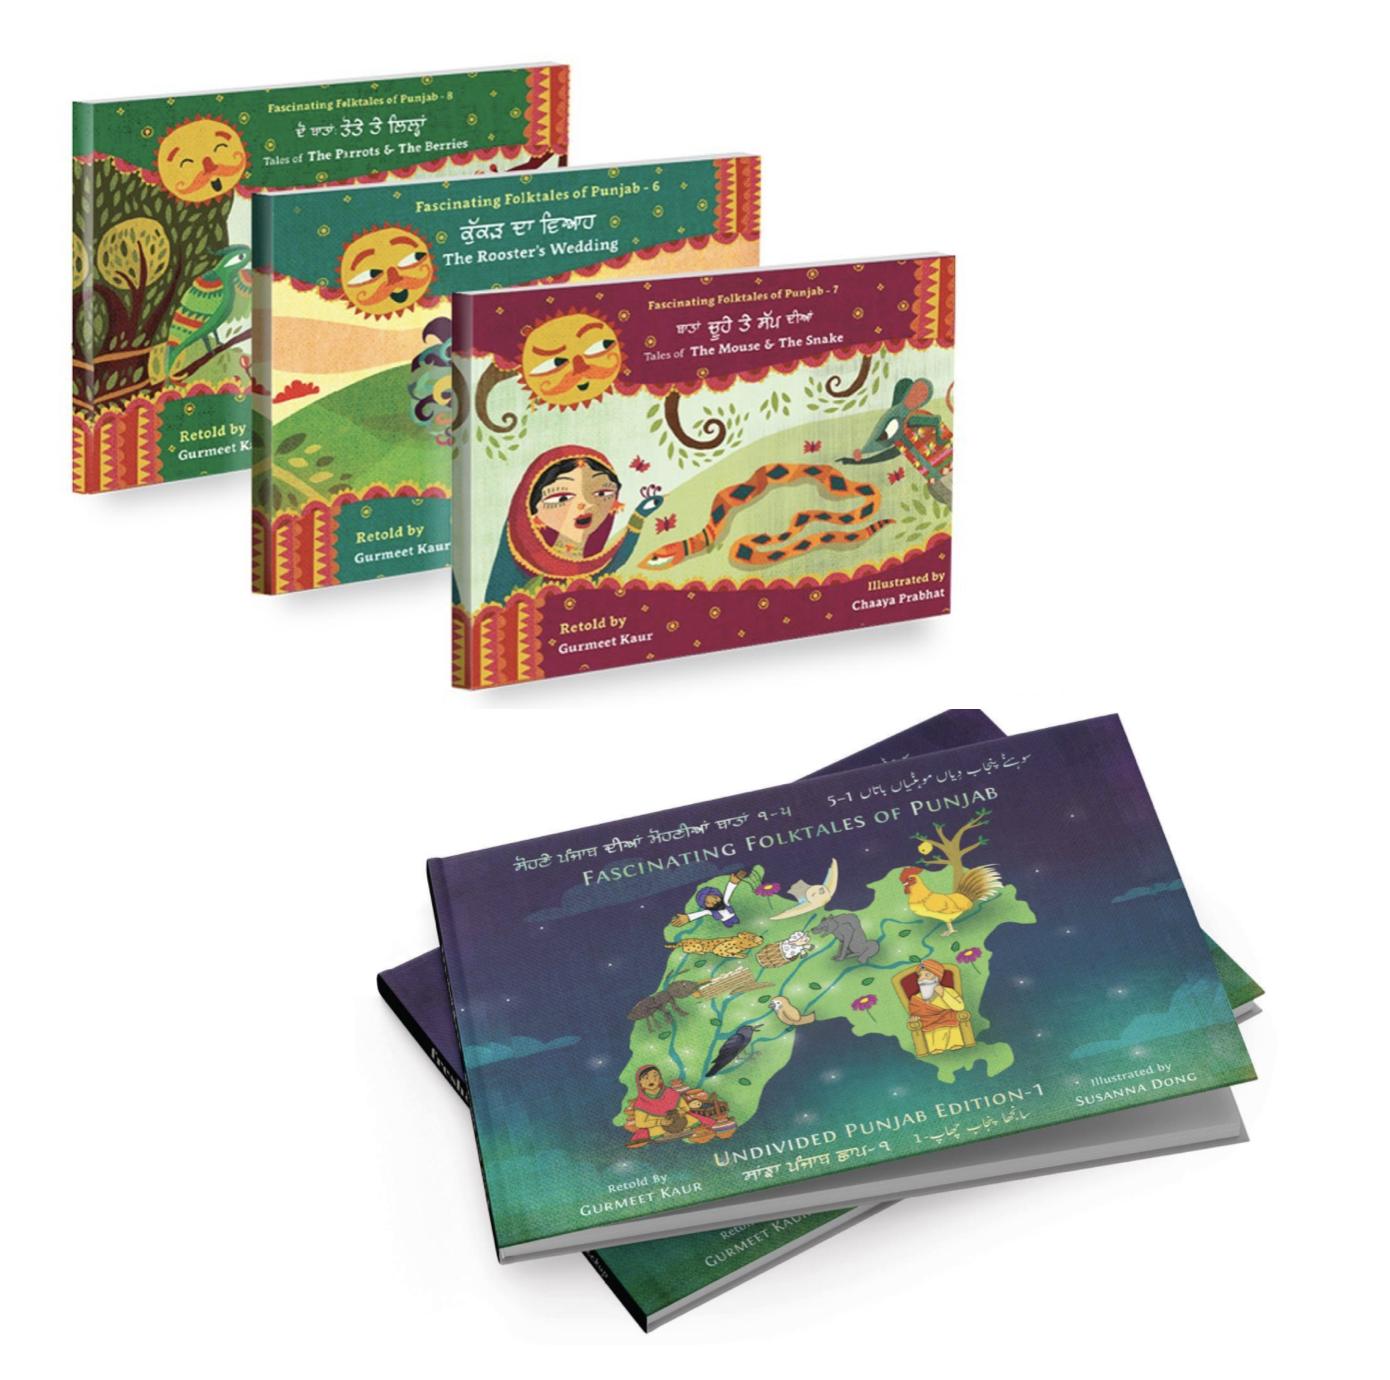 Fascinating Folktales of Punjab - Books 6-8 + Undivided Punjab Edition